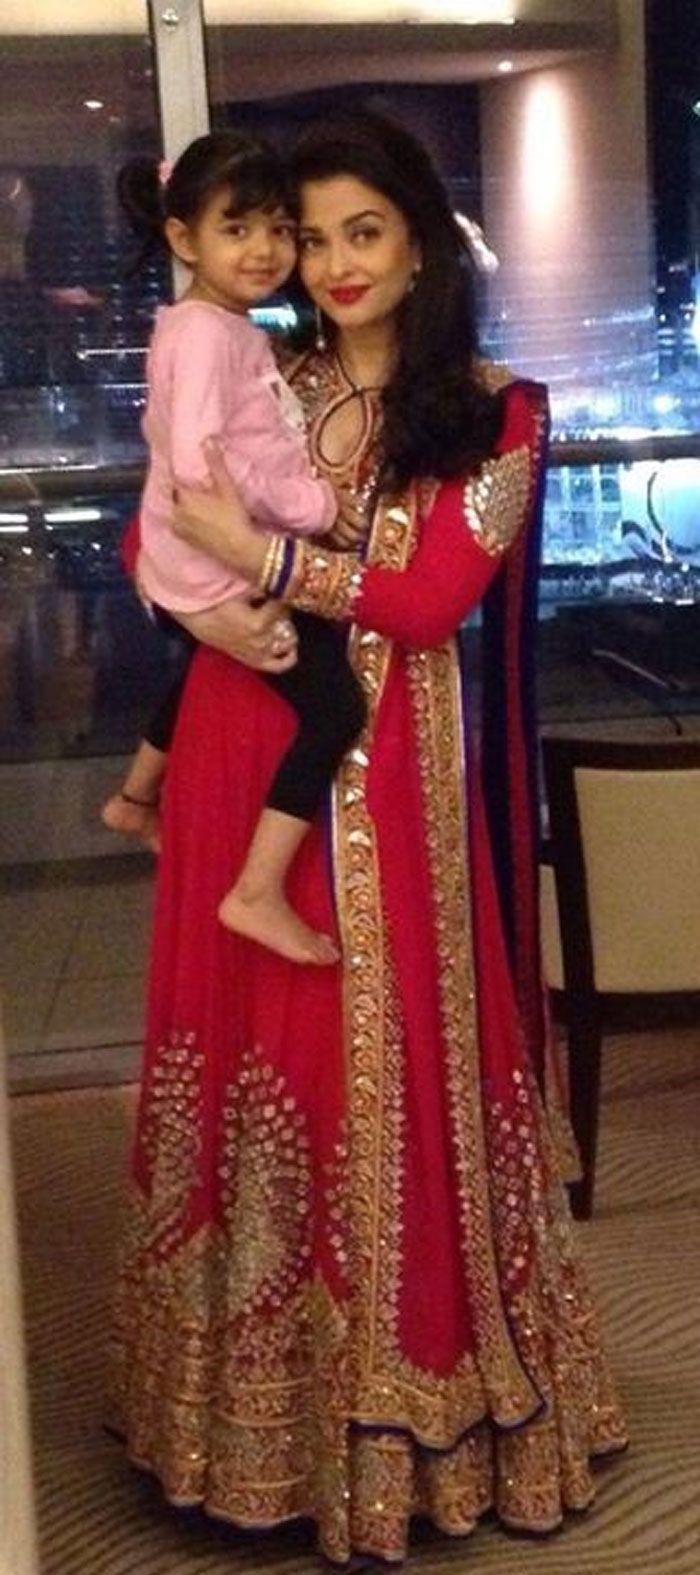 Aishwarya Rai Bachchan and birthday girl Aaradhya were in Dubai to celebrate Aaradhya's 3rd birthday.